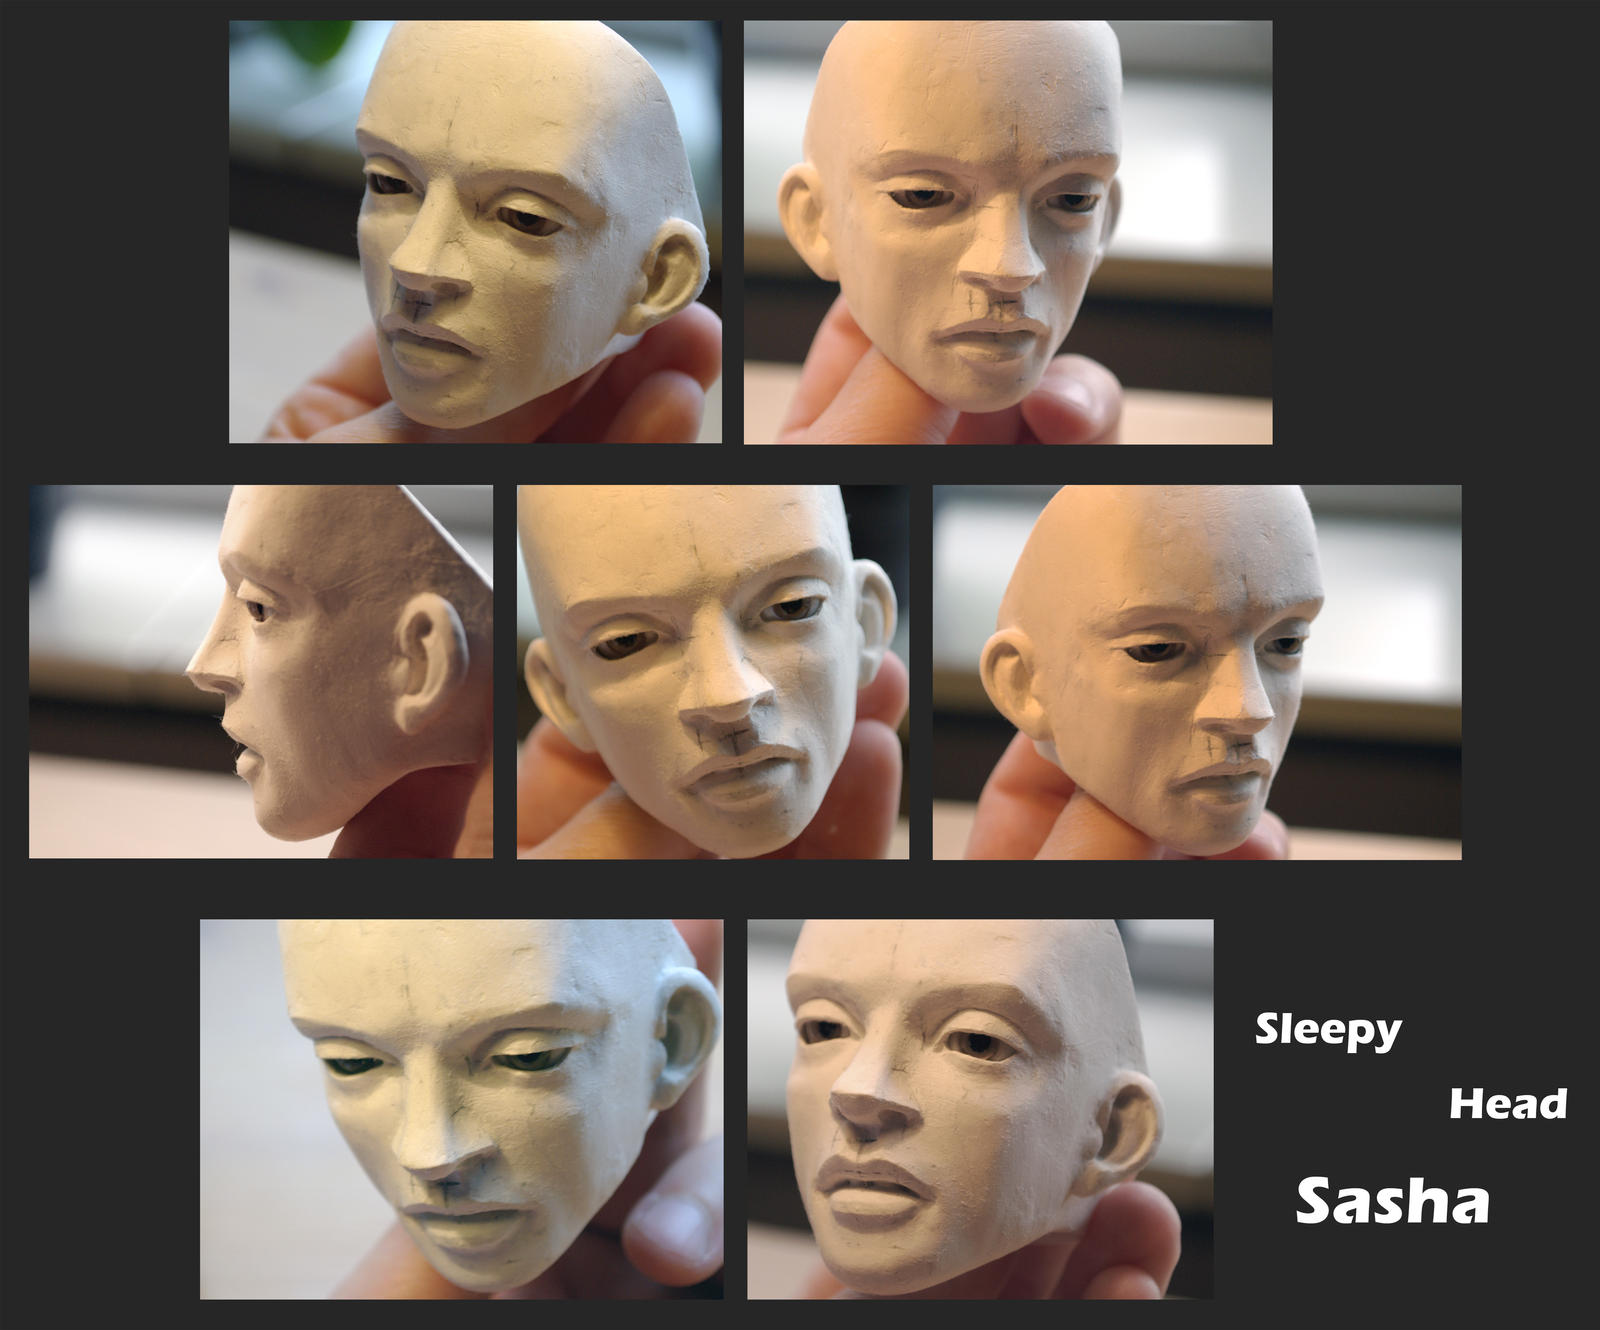 BJD: SleepyHeadSasha - Ready for Coating by FreakStyleBJD